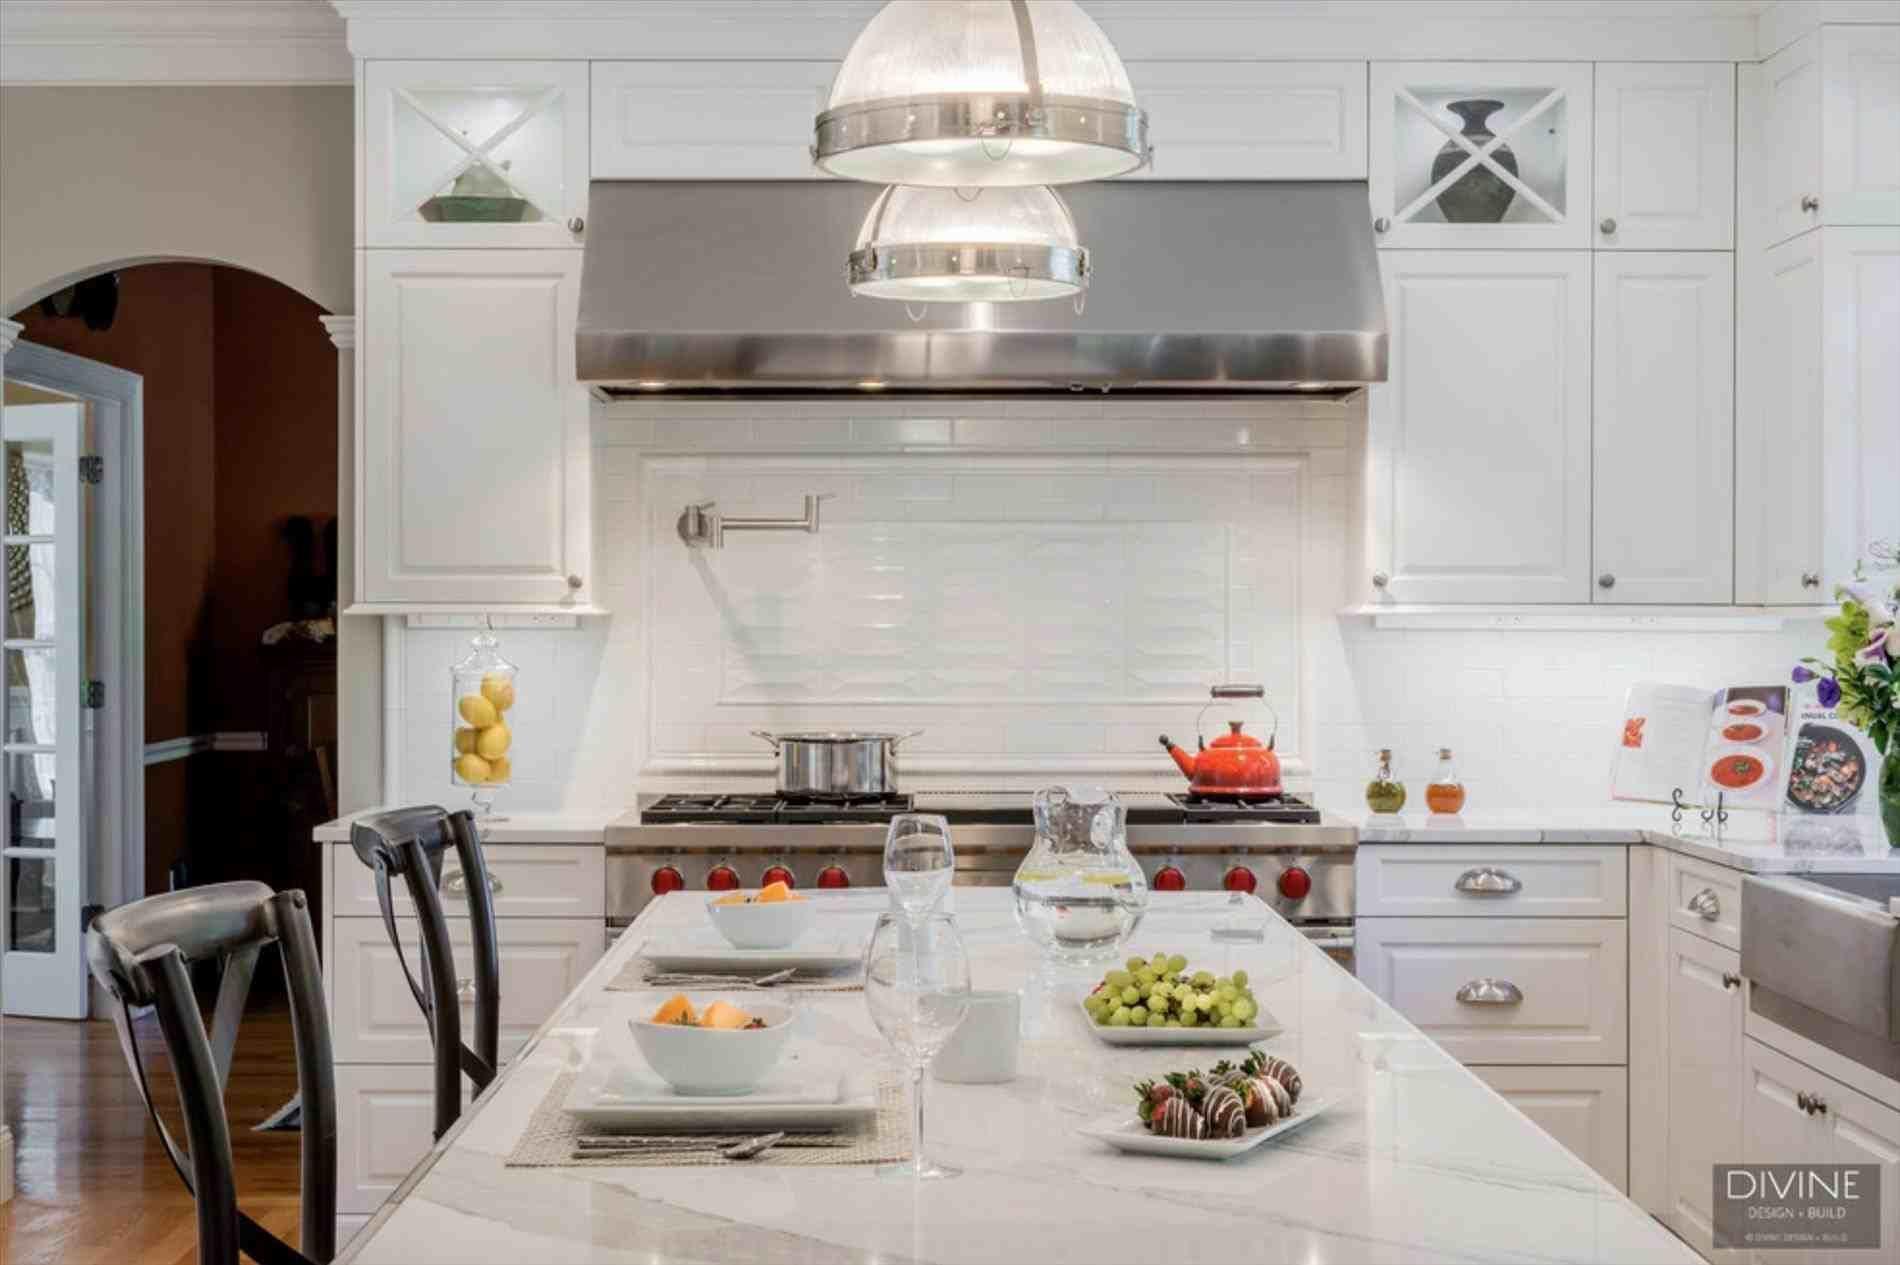 top view post transitional kitchen designs photo gallery visit homelivings decor ideas transitionaldecorwhite also rh pinterest